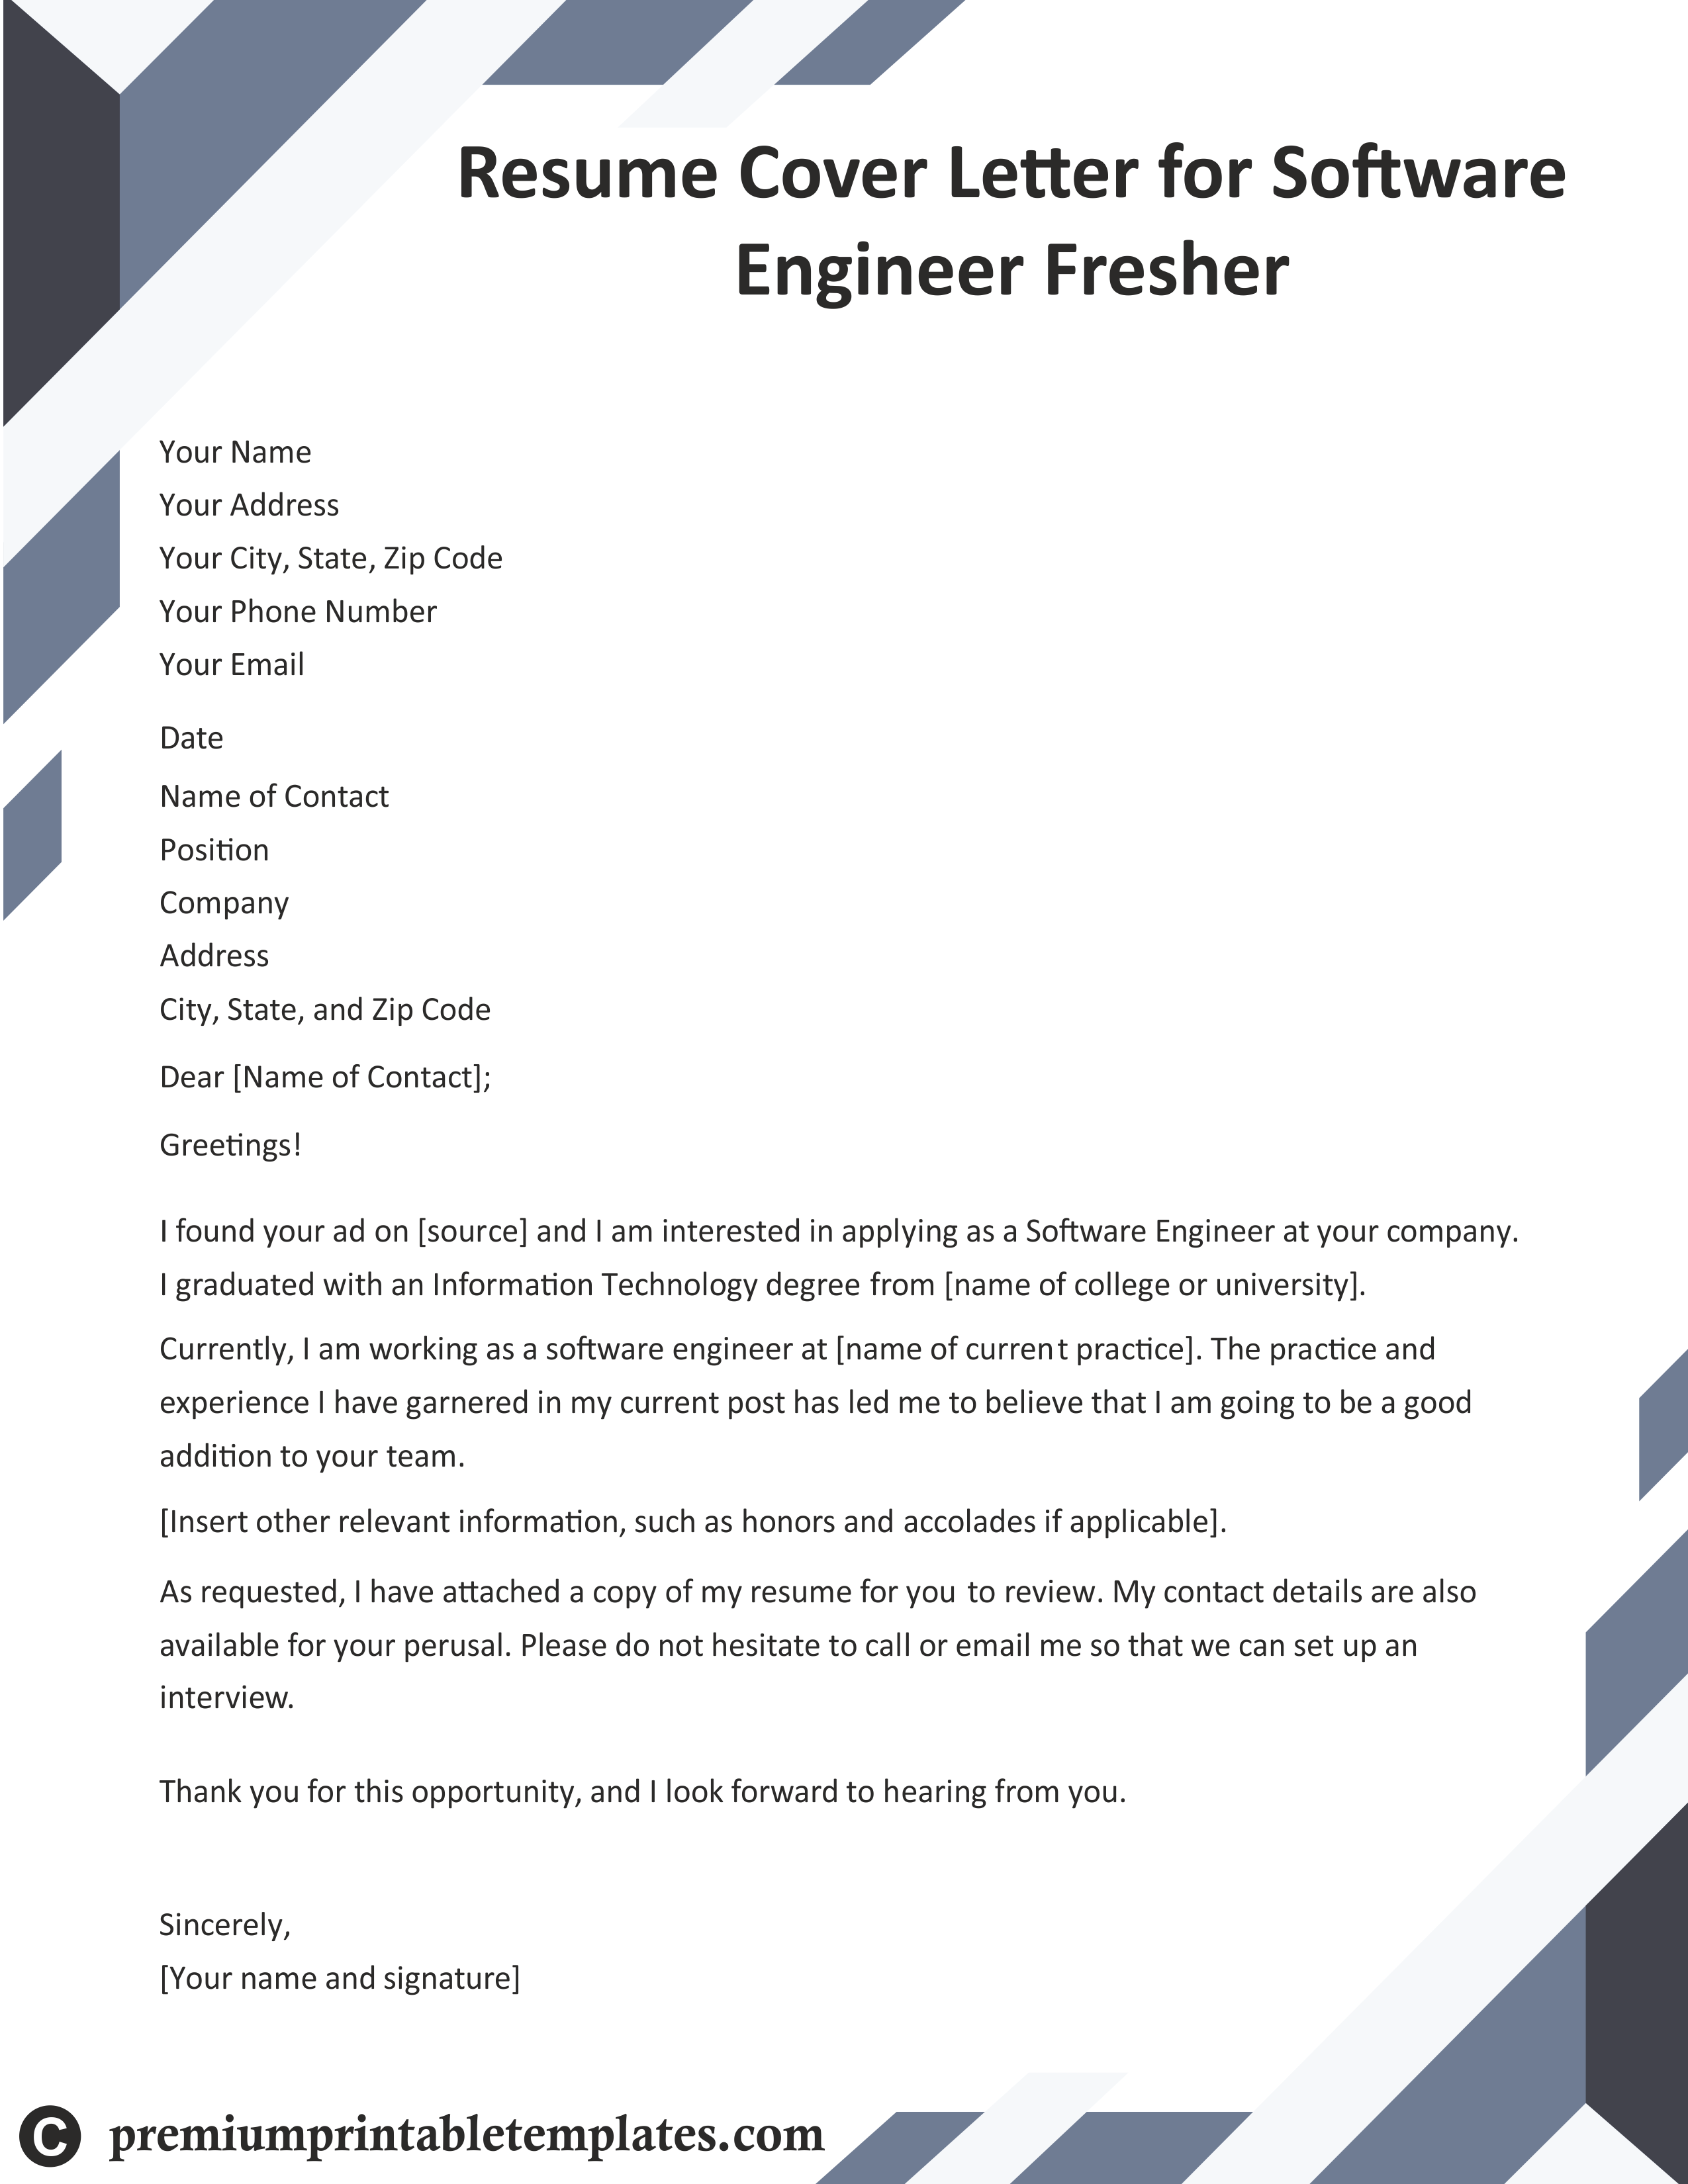 Software Engineer Resume Cover Letter Pack Of 5 Cover Letter For Resume Business Letter Template Cover Letter